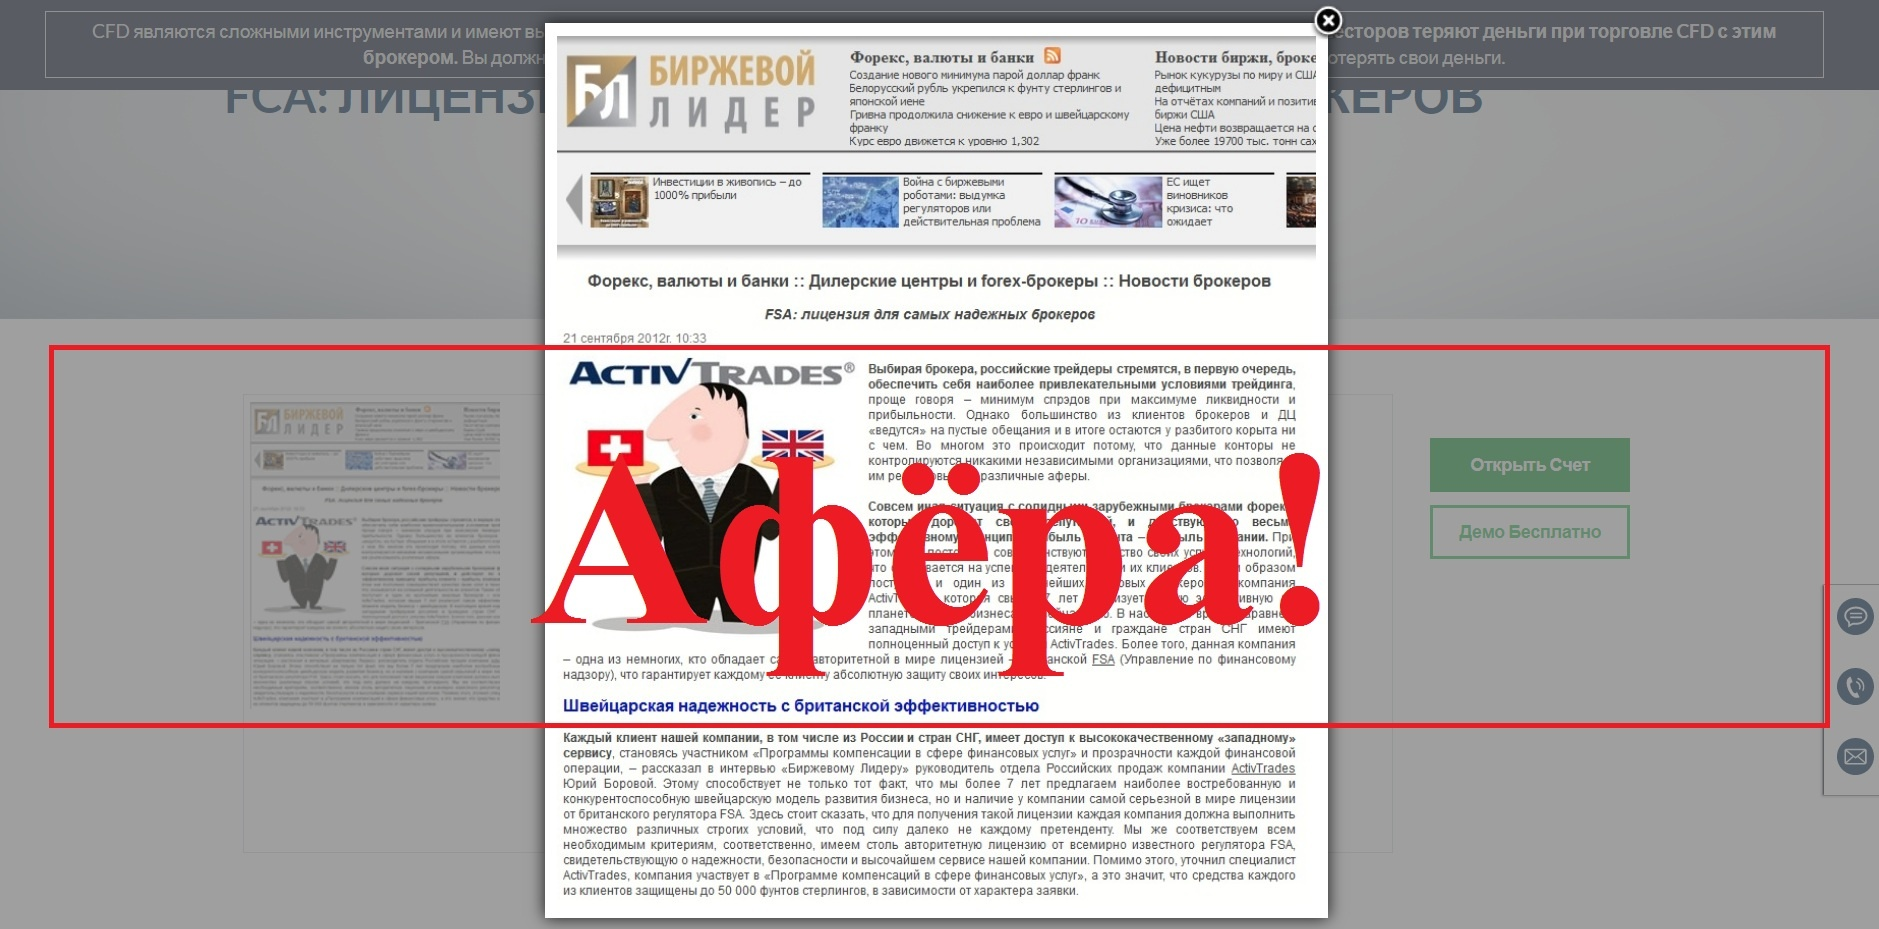 ActivTrades – отзывы о брокере activtrades.bs